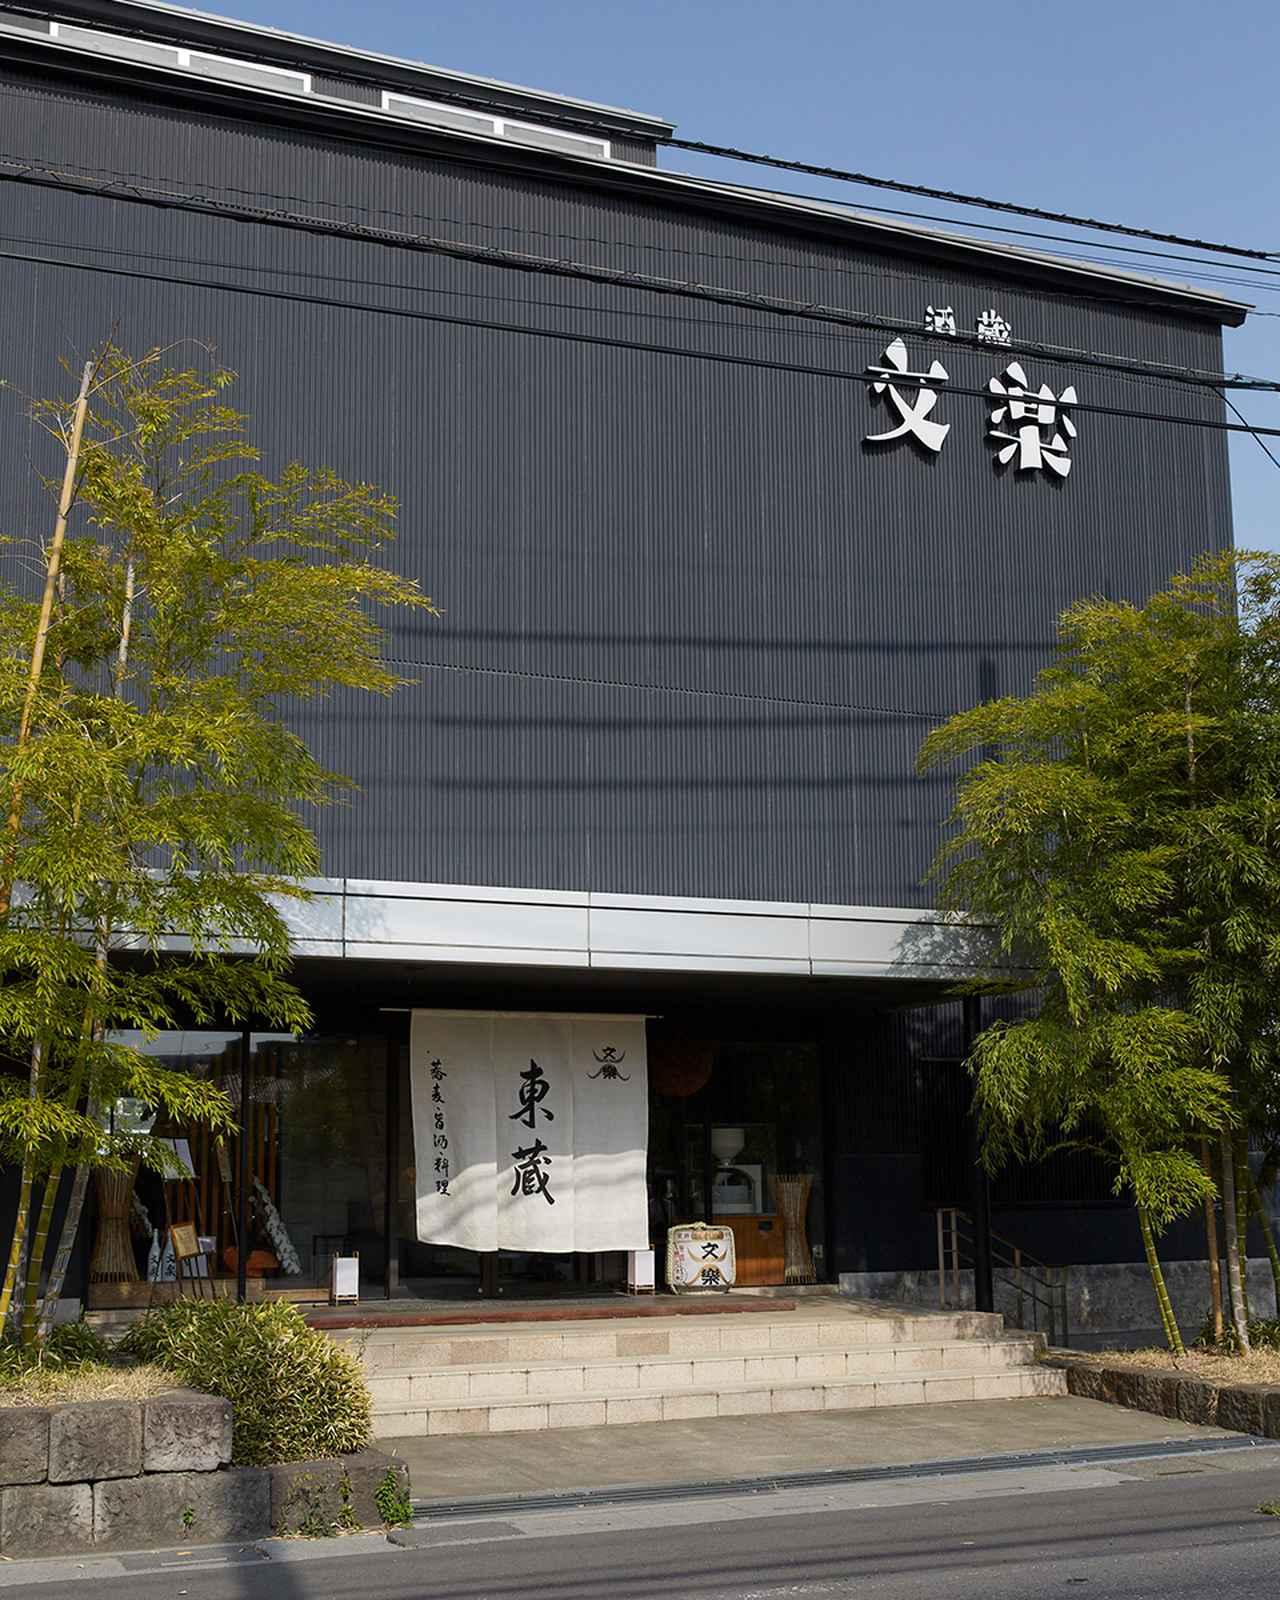 Images : 1番目の画像 - 「日本酒応援団を支える 酒蔵を訪ねて Vol.2 ~ 埼玉県上尾市「北西酒造」~」のアルバム - T JAPAN:The New York Times Style Magazine 公式サイト